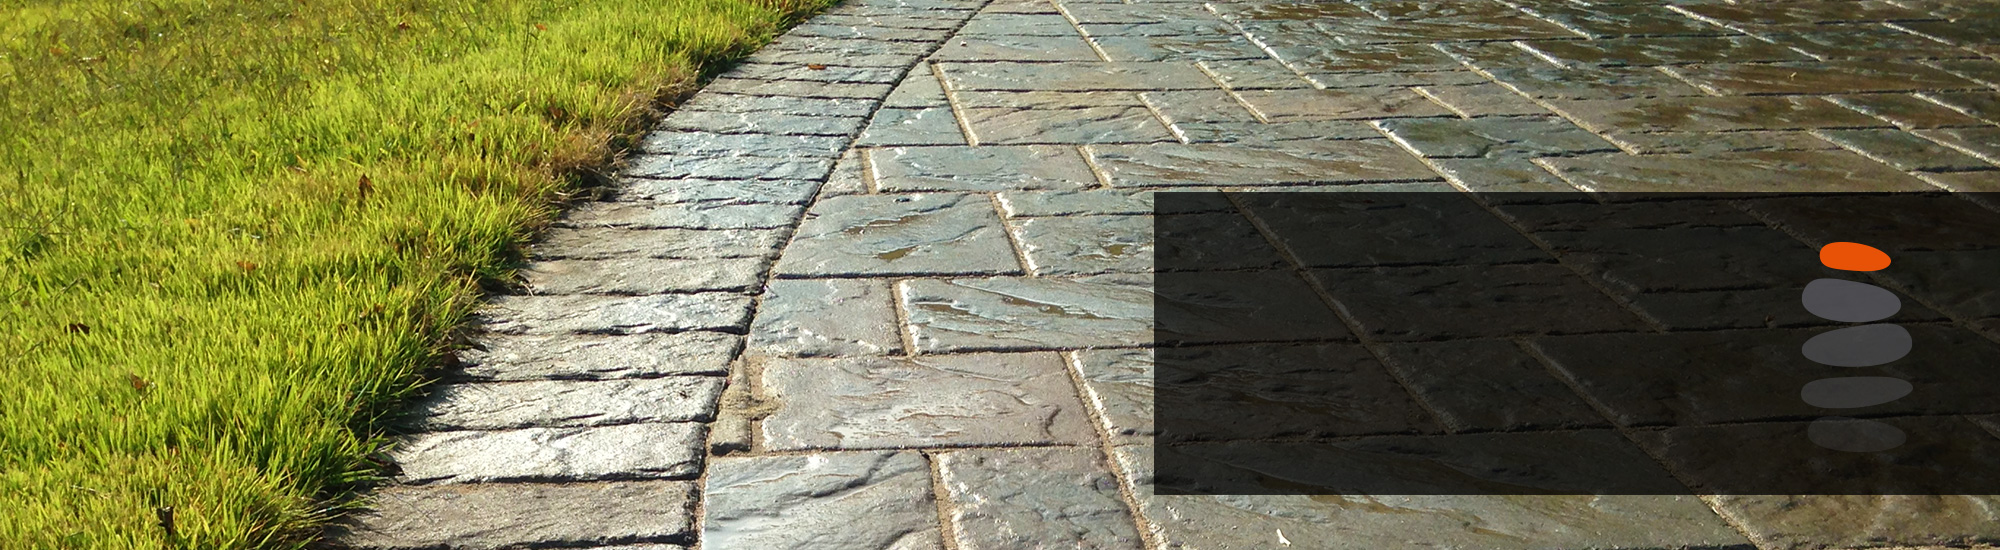 COVISFranchising_Website_Slider-2000x550-DrivewayStones